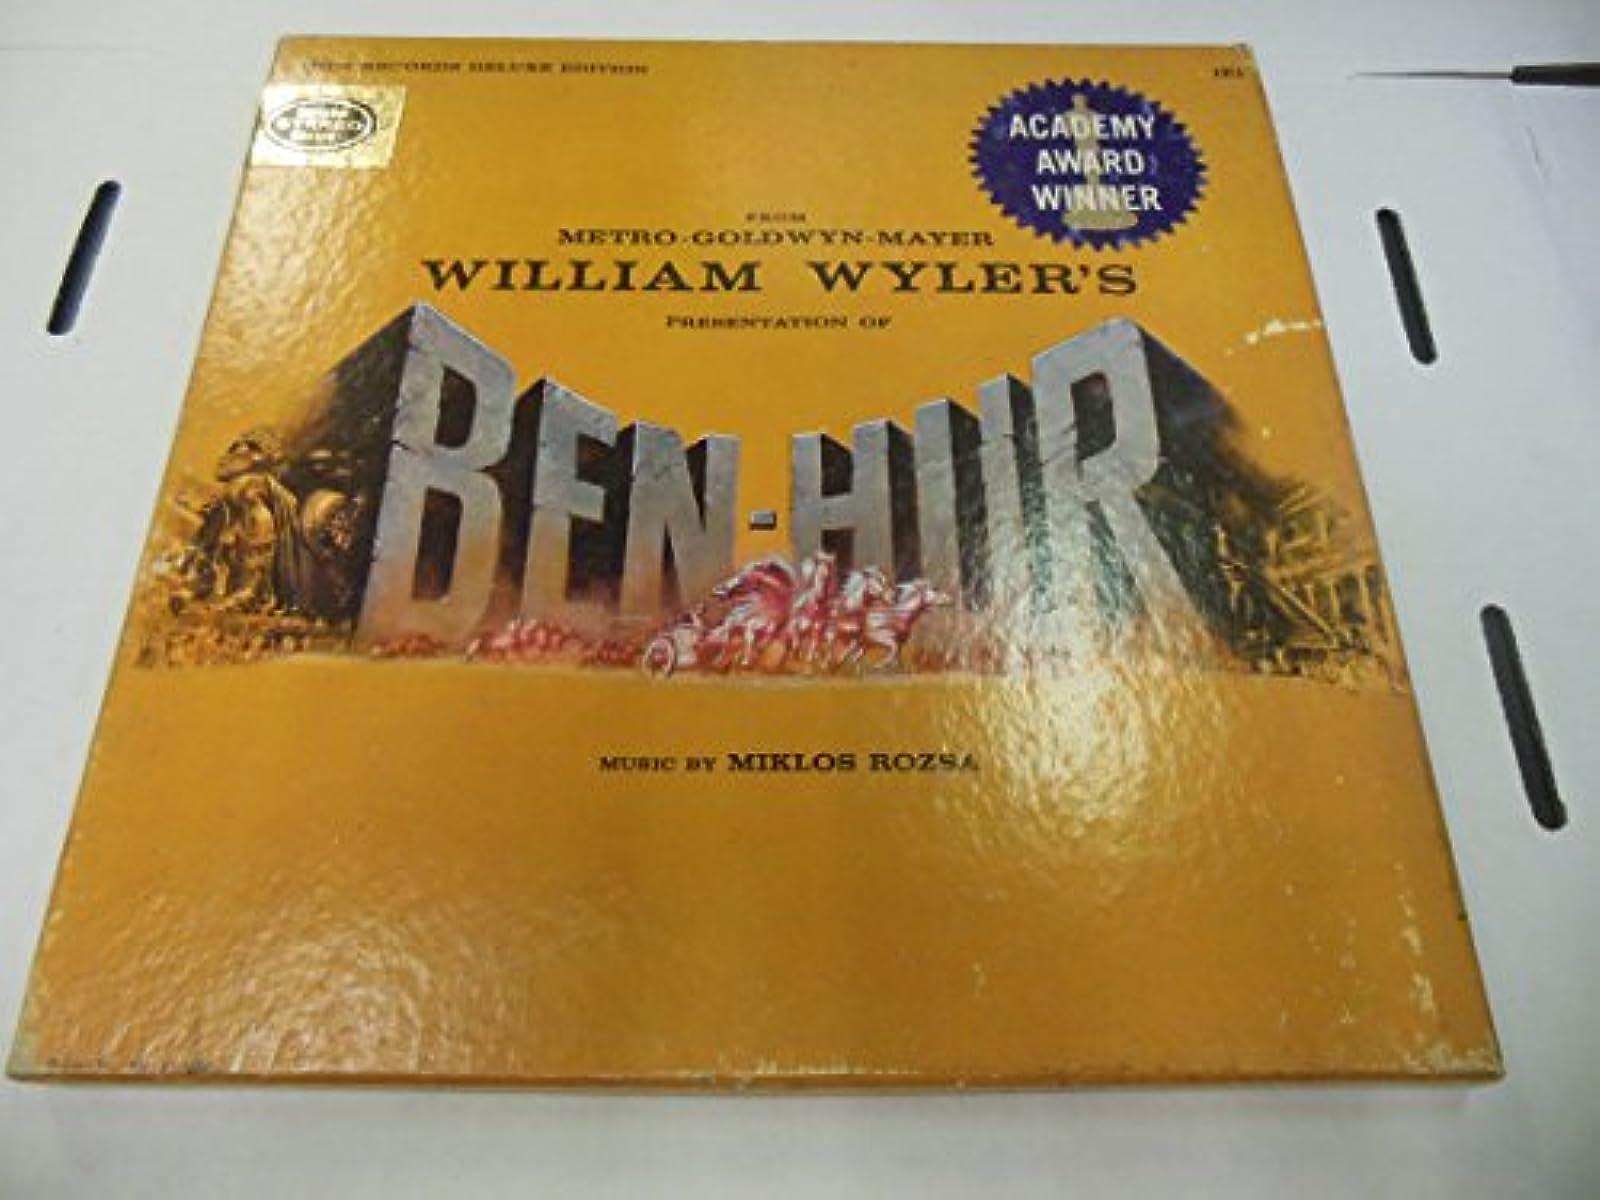 From Metro-Goldwyn-Mayer William Wylers Presentation Of Ben-Hur Music By Miklos